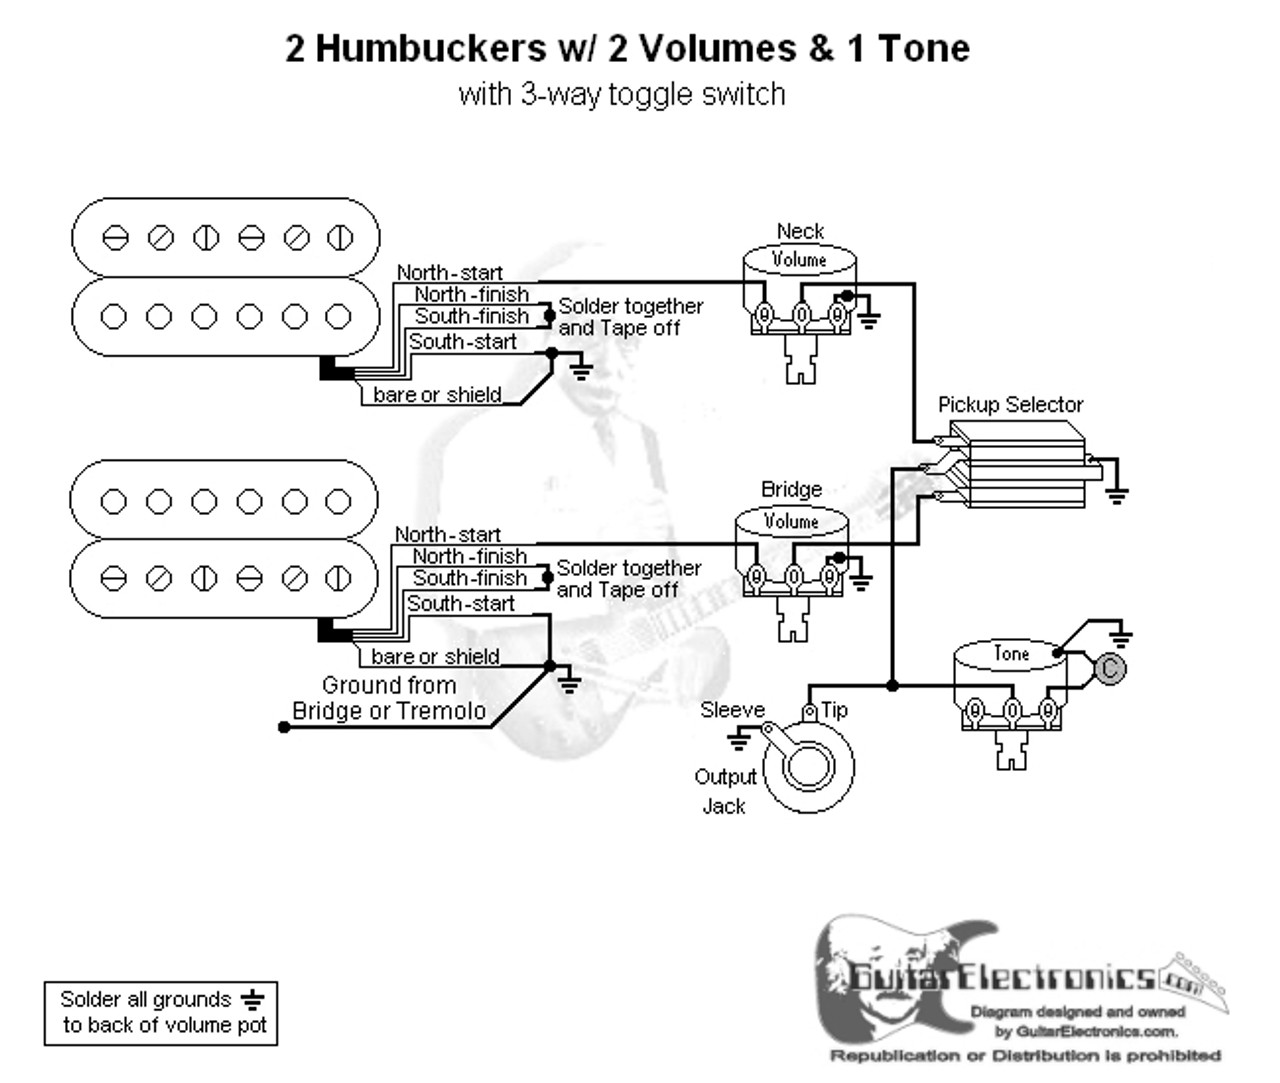 medium resolution of guitar wiring diagram 2 volume 1 tone wiring diagram img 2 humbuckers 3 way toggle switch